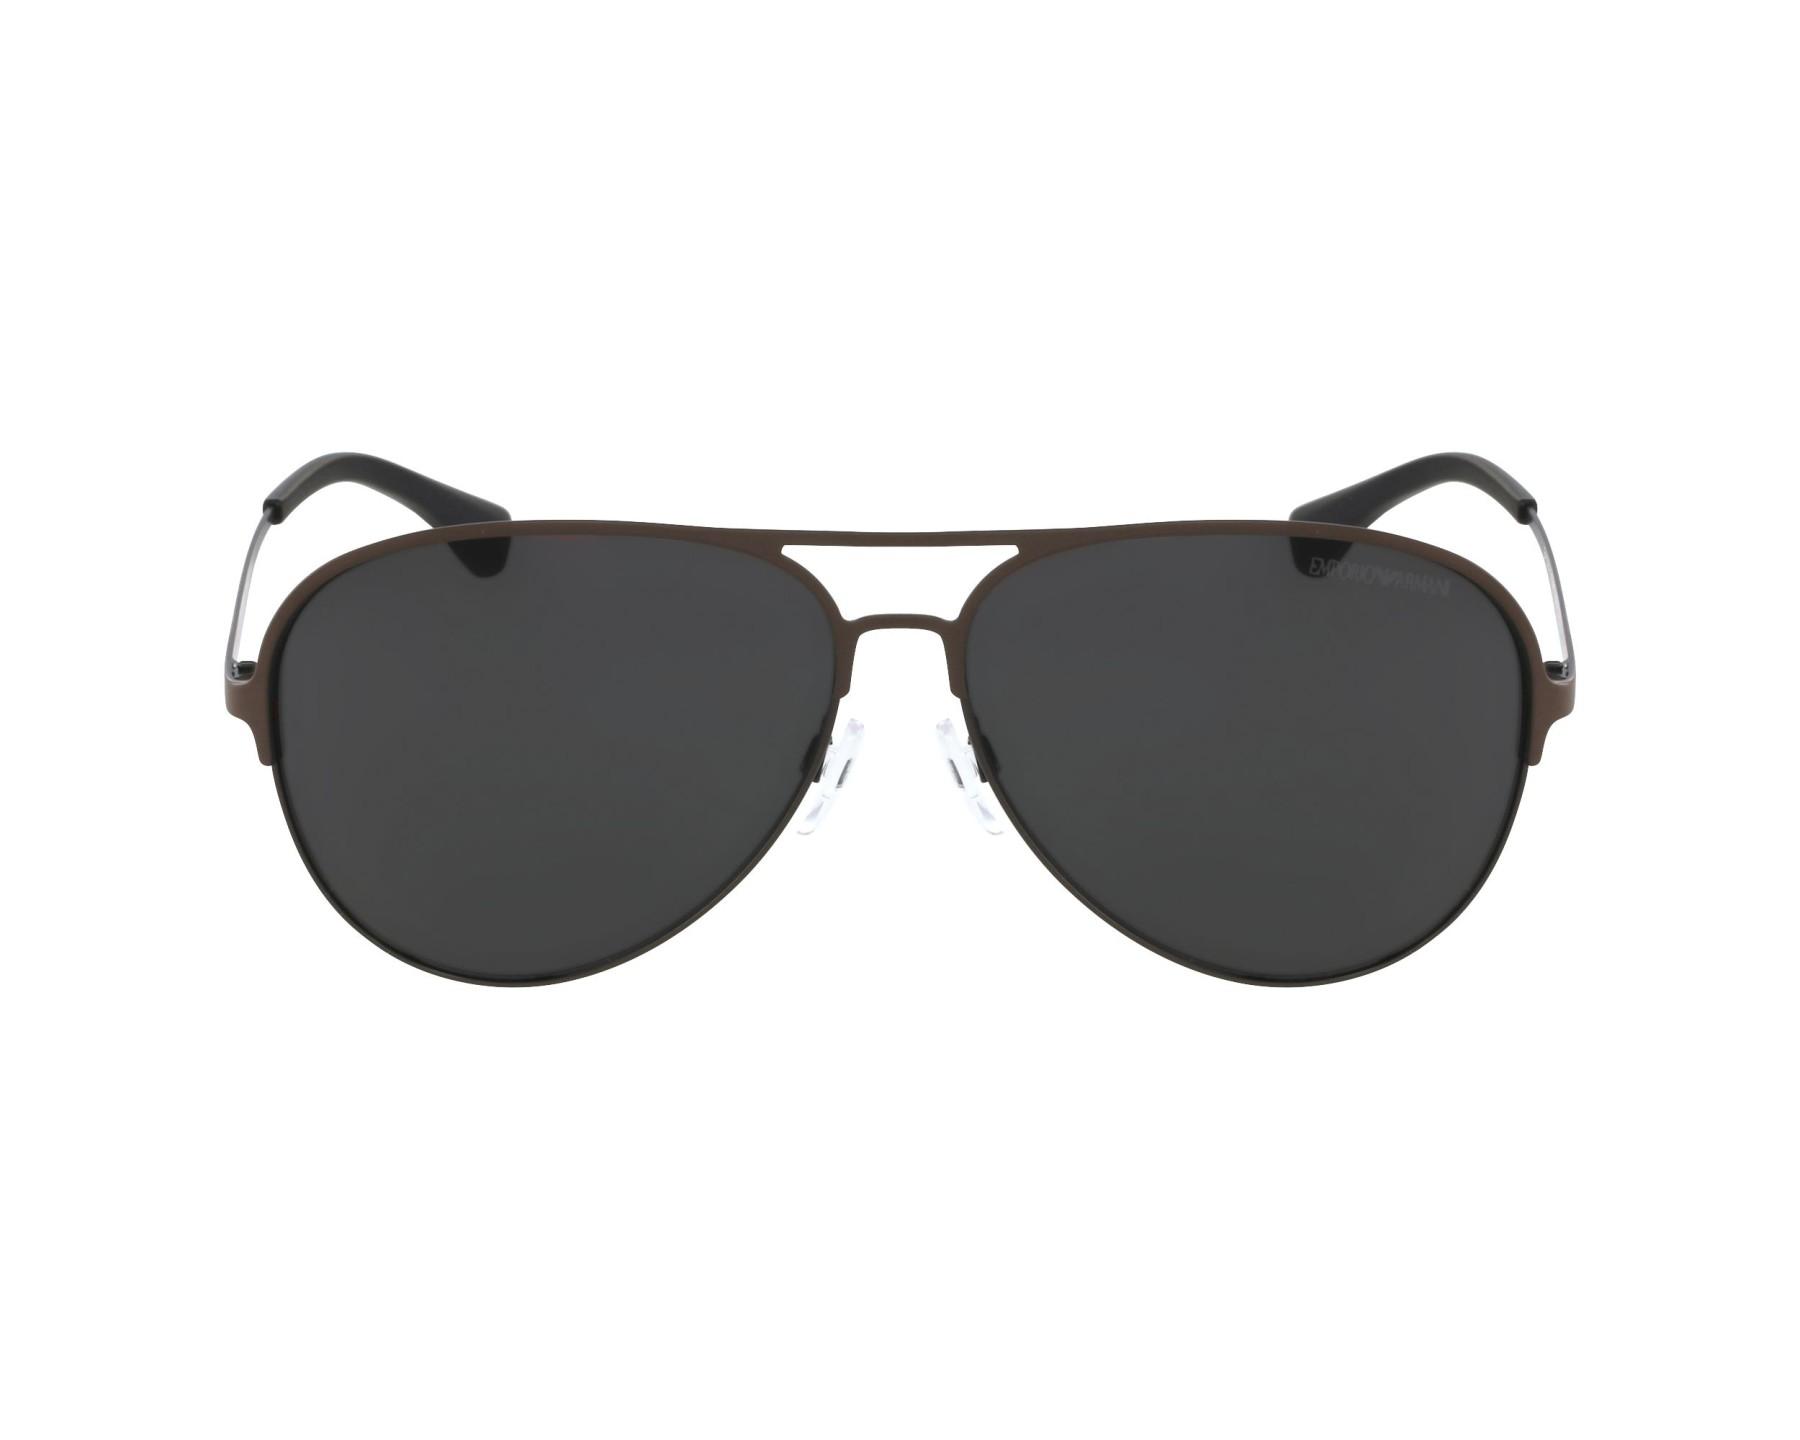 a966beeee4 thumbnail Sunglasses Emporio Armani EA-2032 3128 87 - Brown profile view